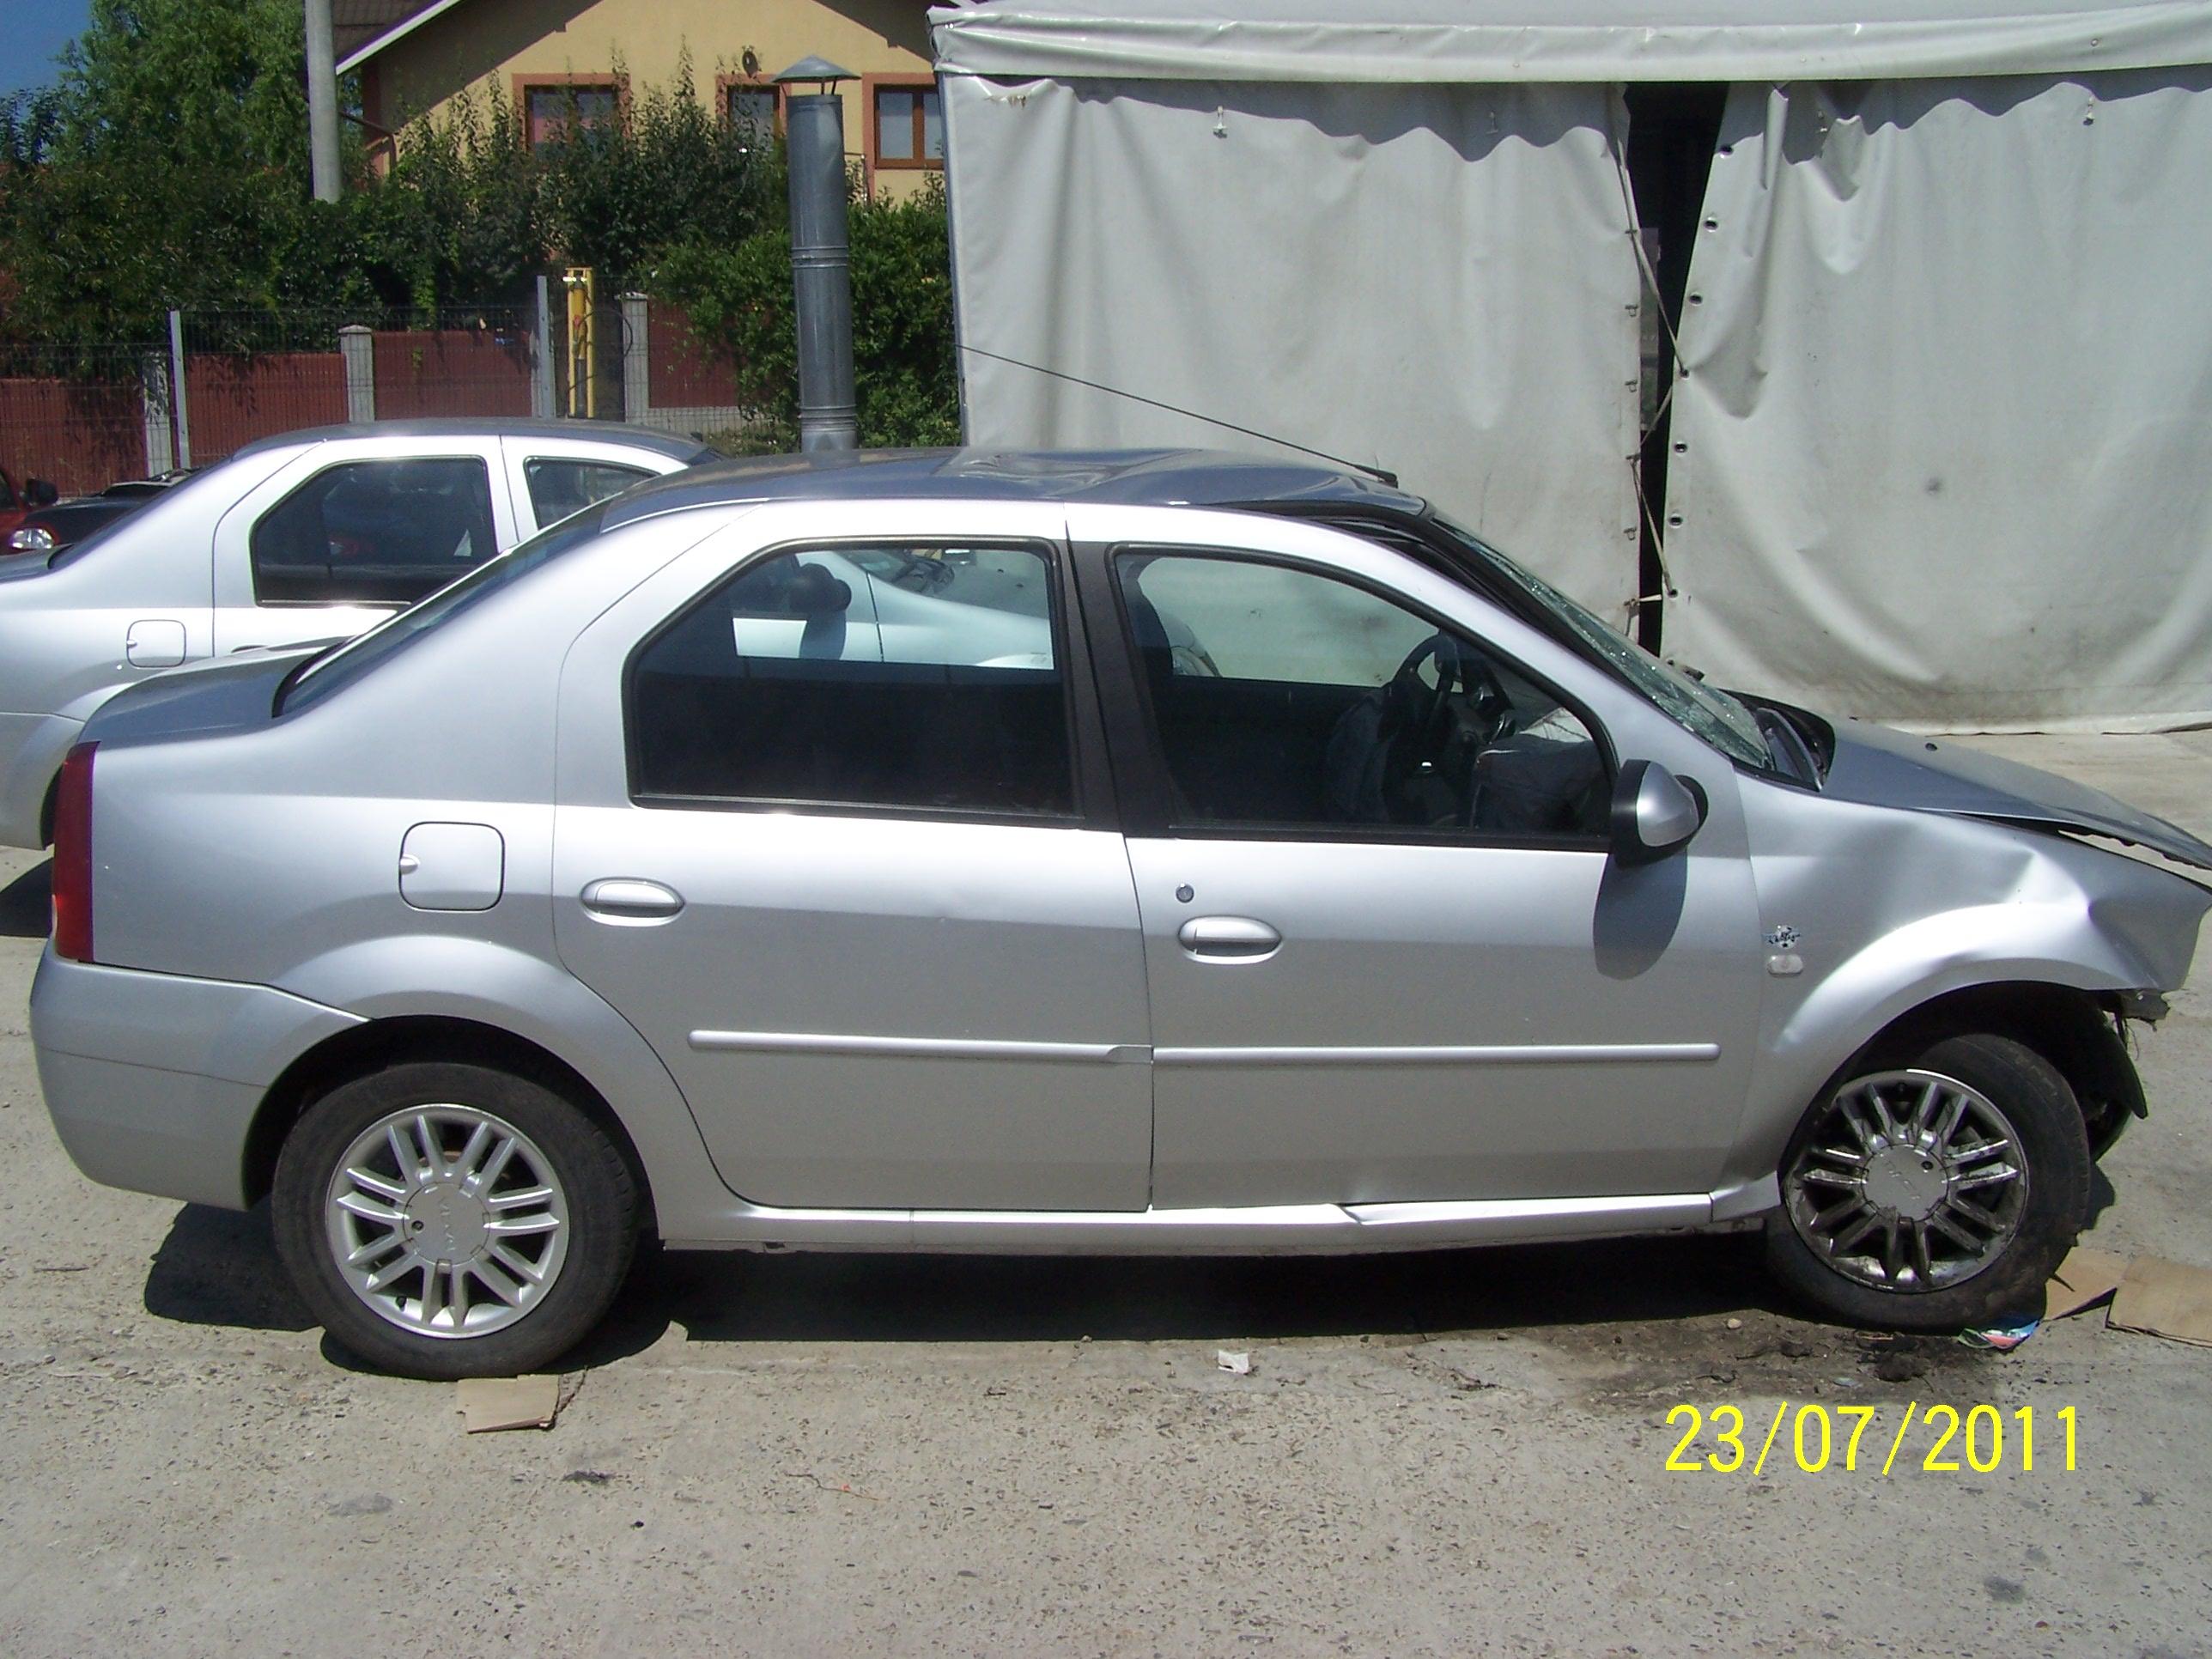 Dacia Logan avariat 2008 Diesel Berlina - 31 Iulie 2011 - Poza 5